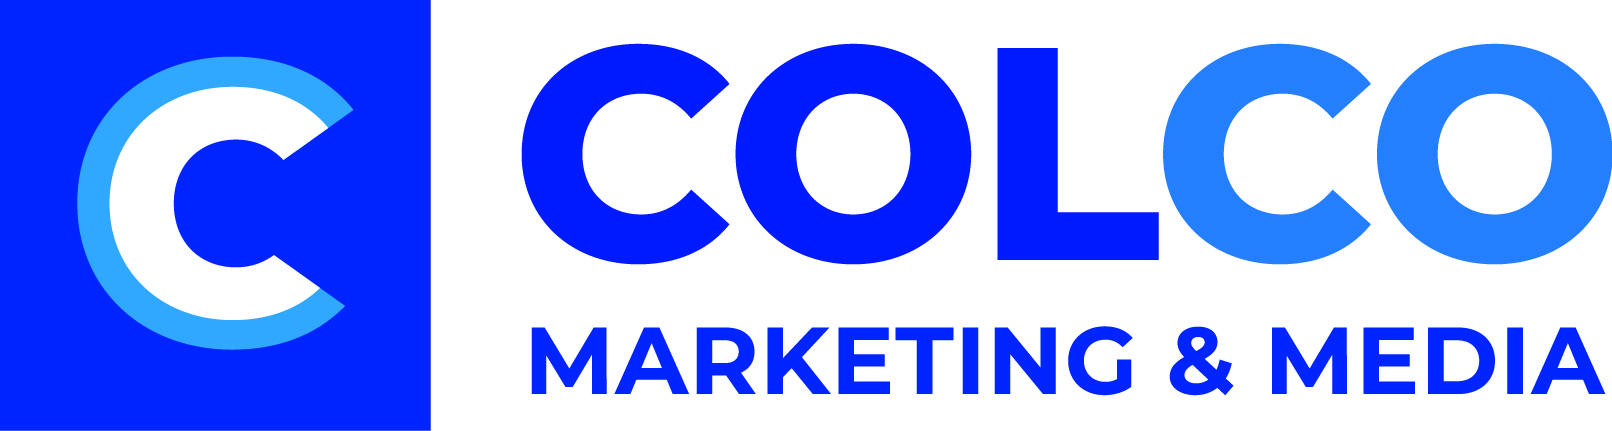 COLCO Marketing & Media